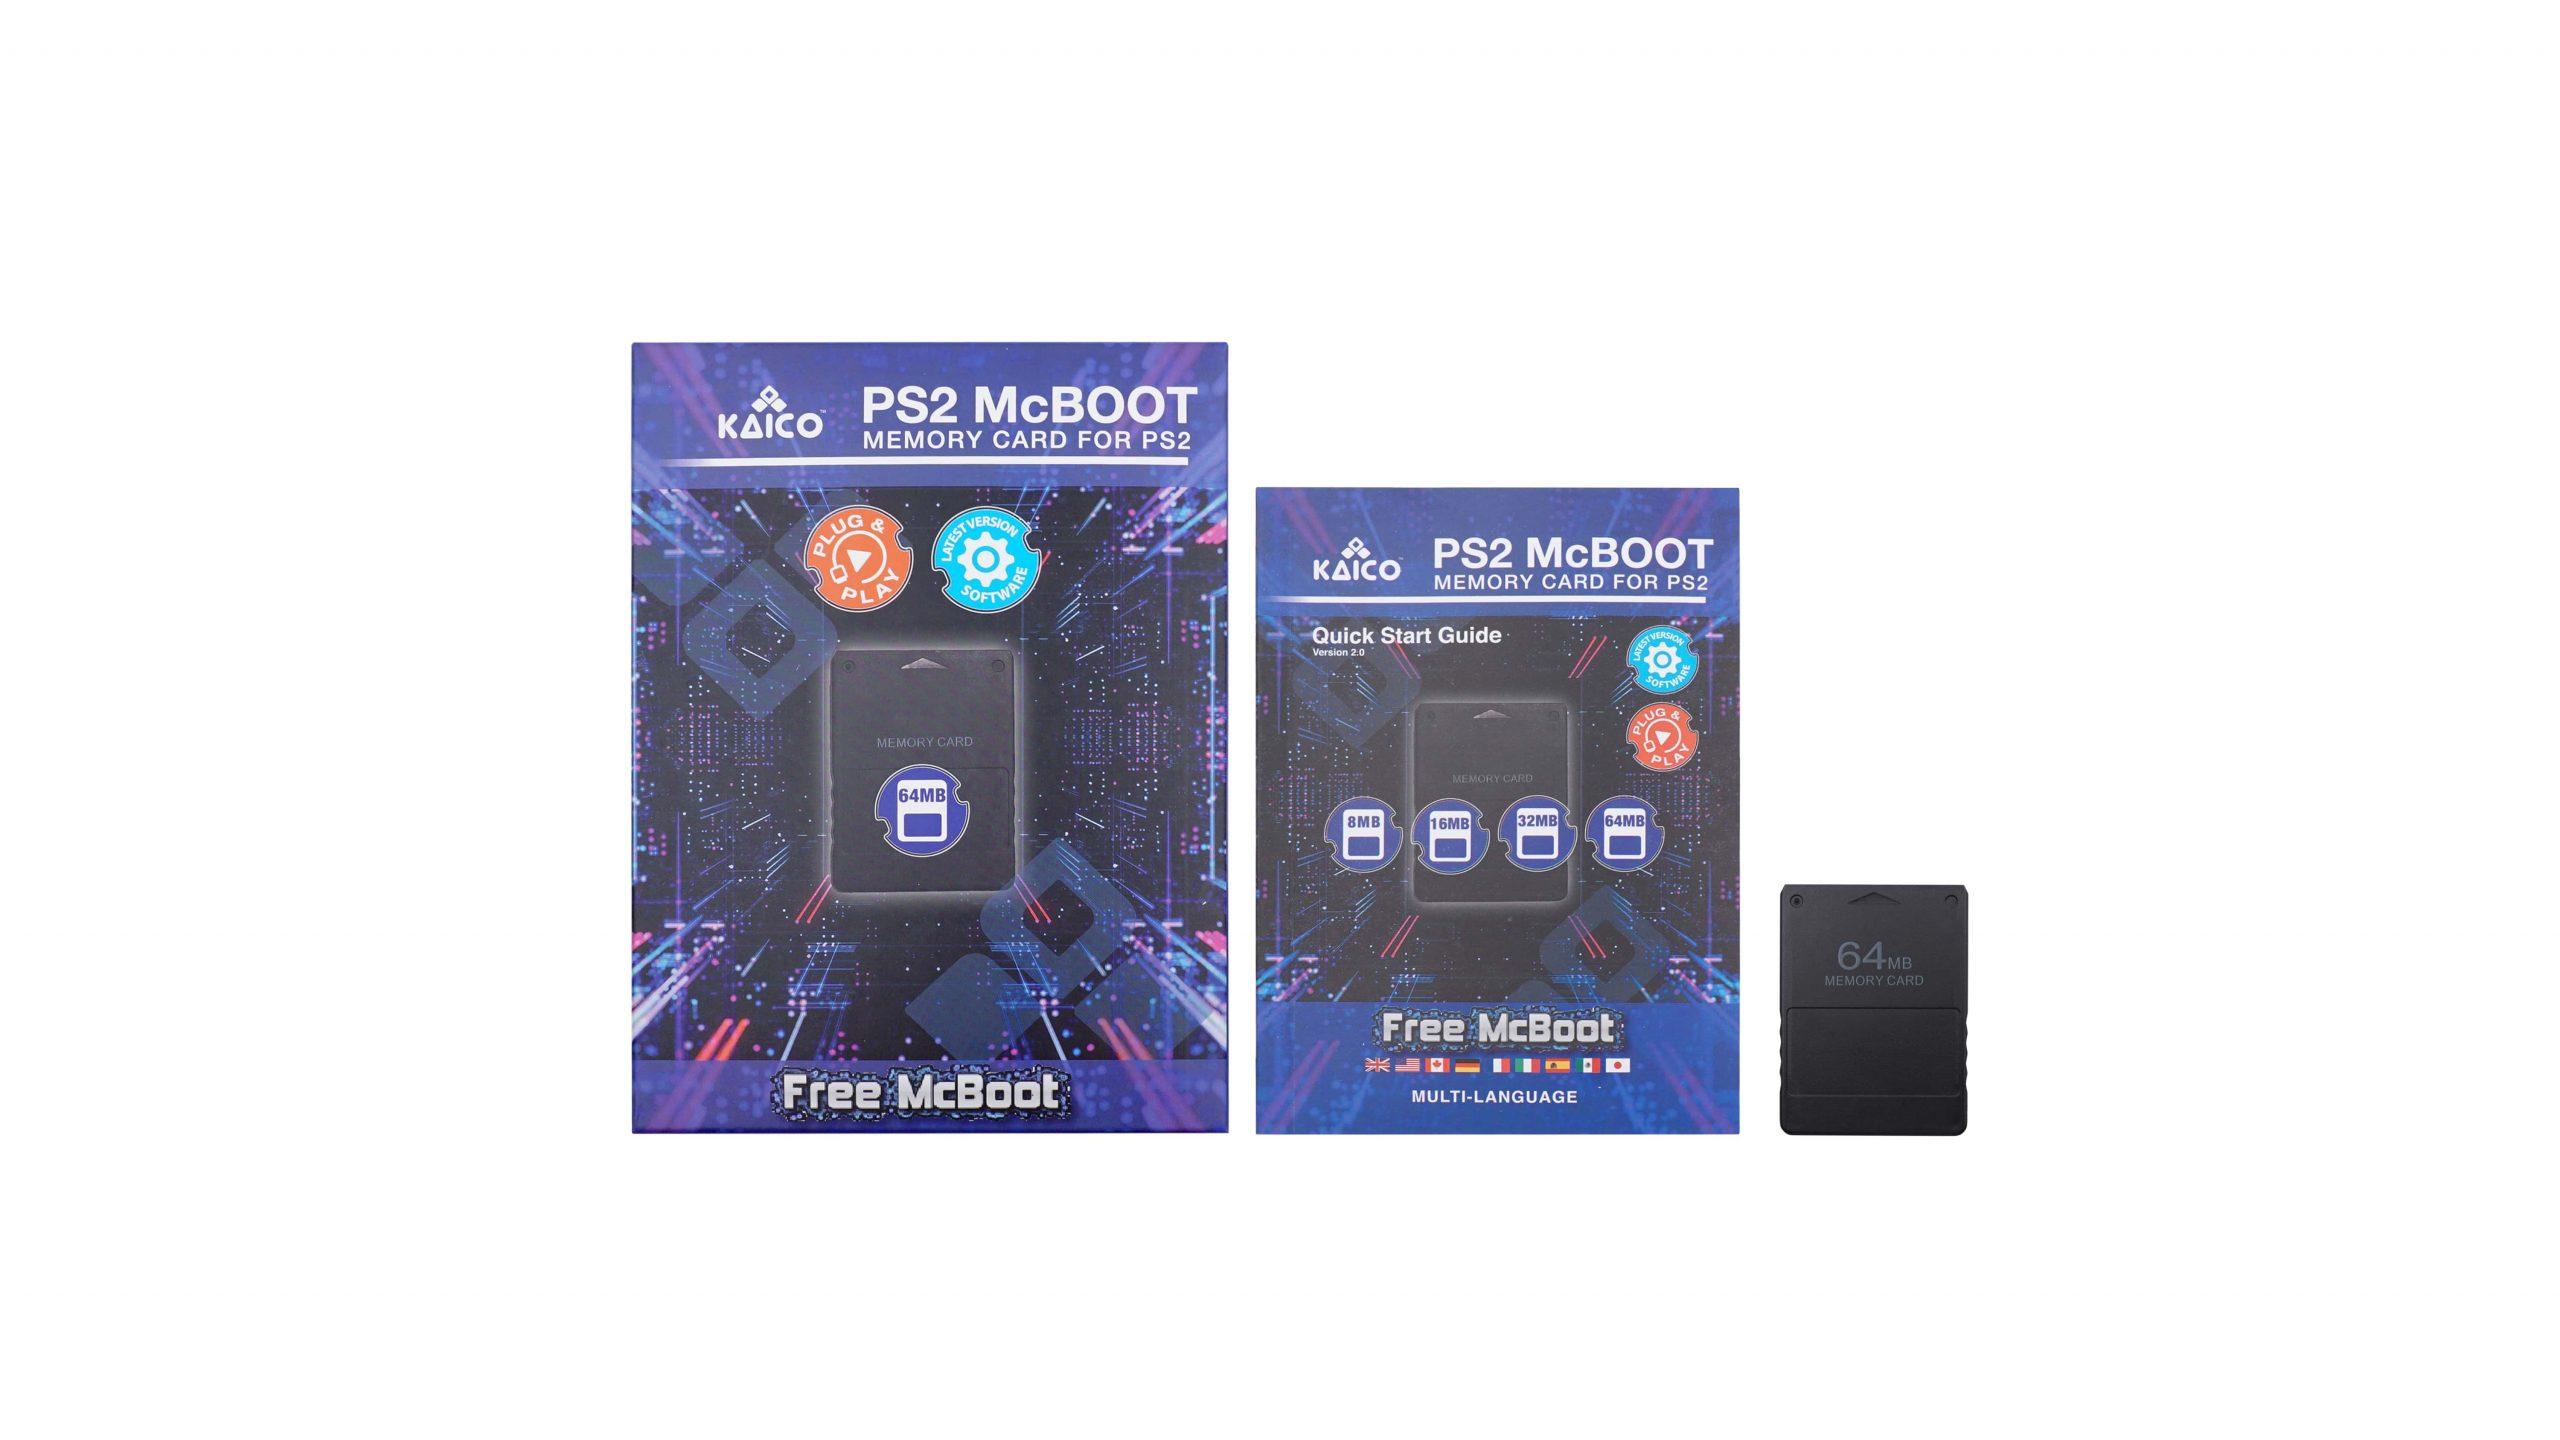 Dvignite Se Ps2 Memory Card To Usb